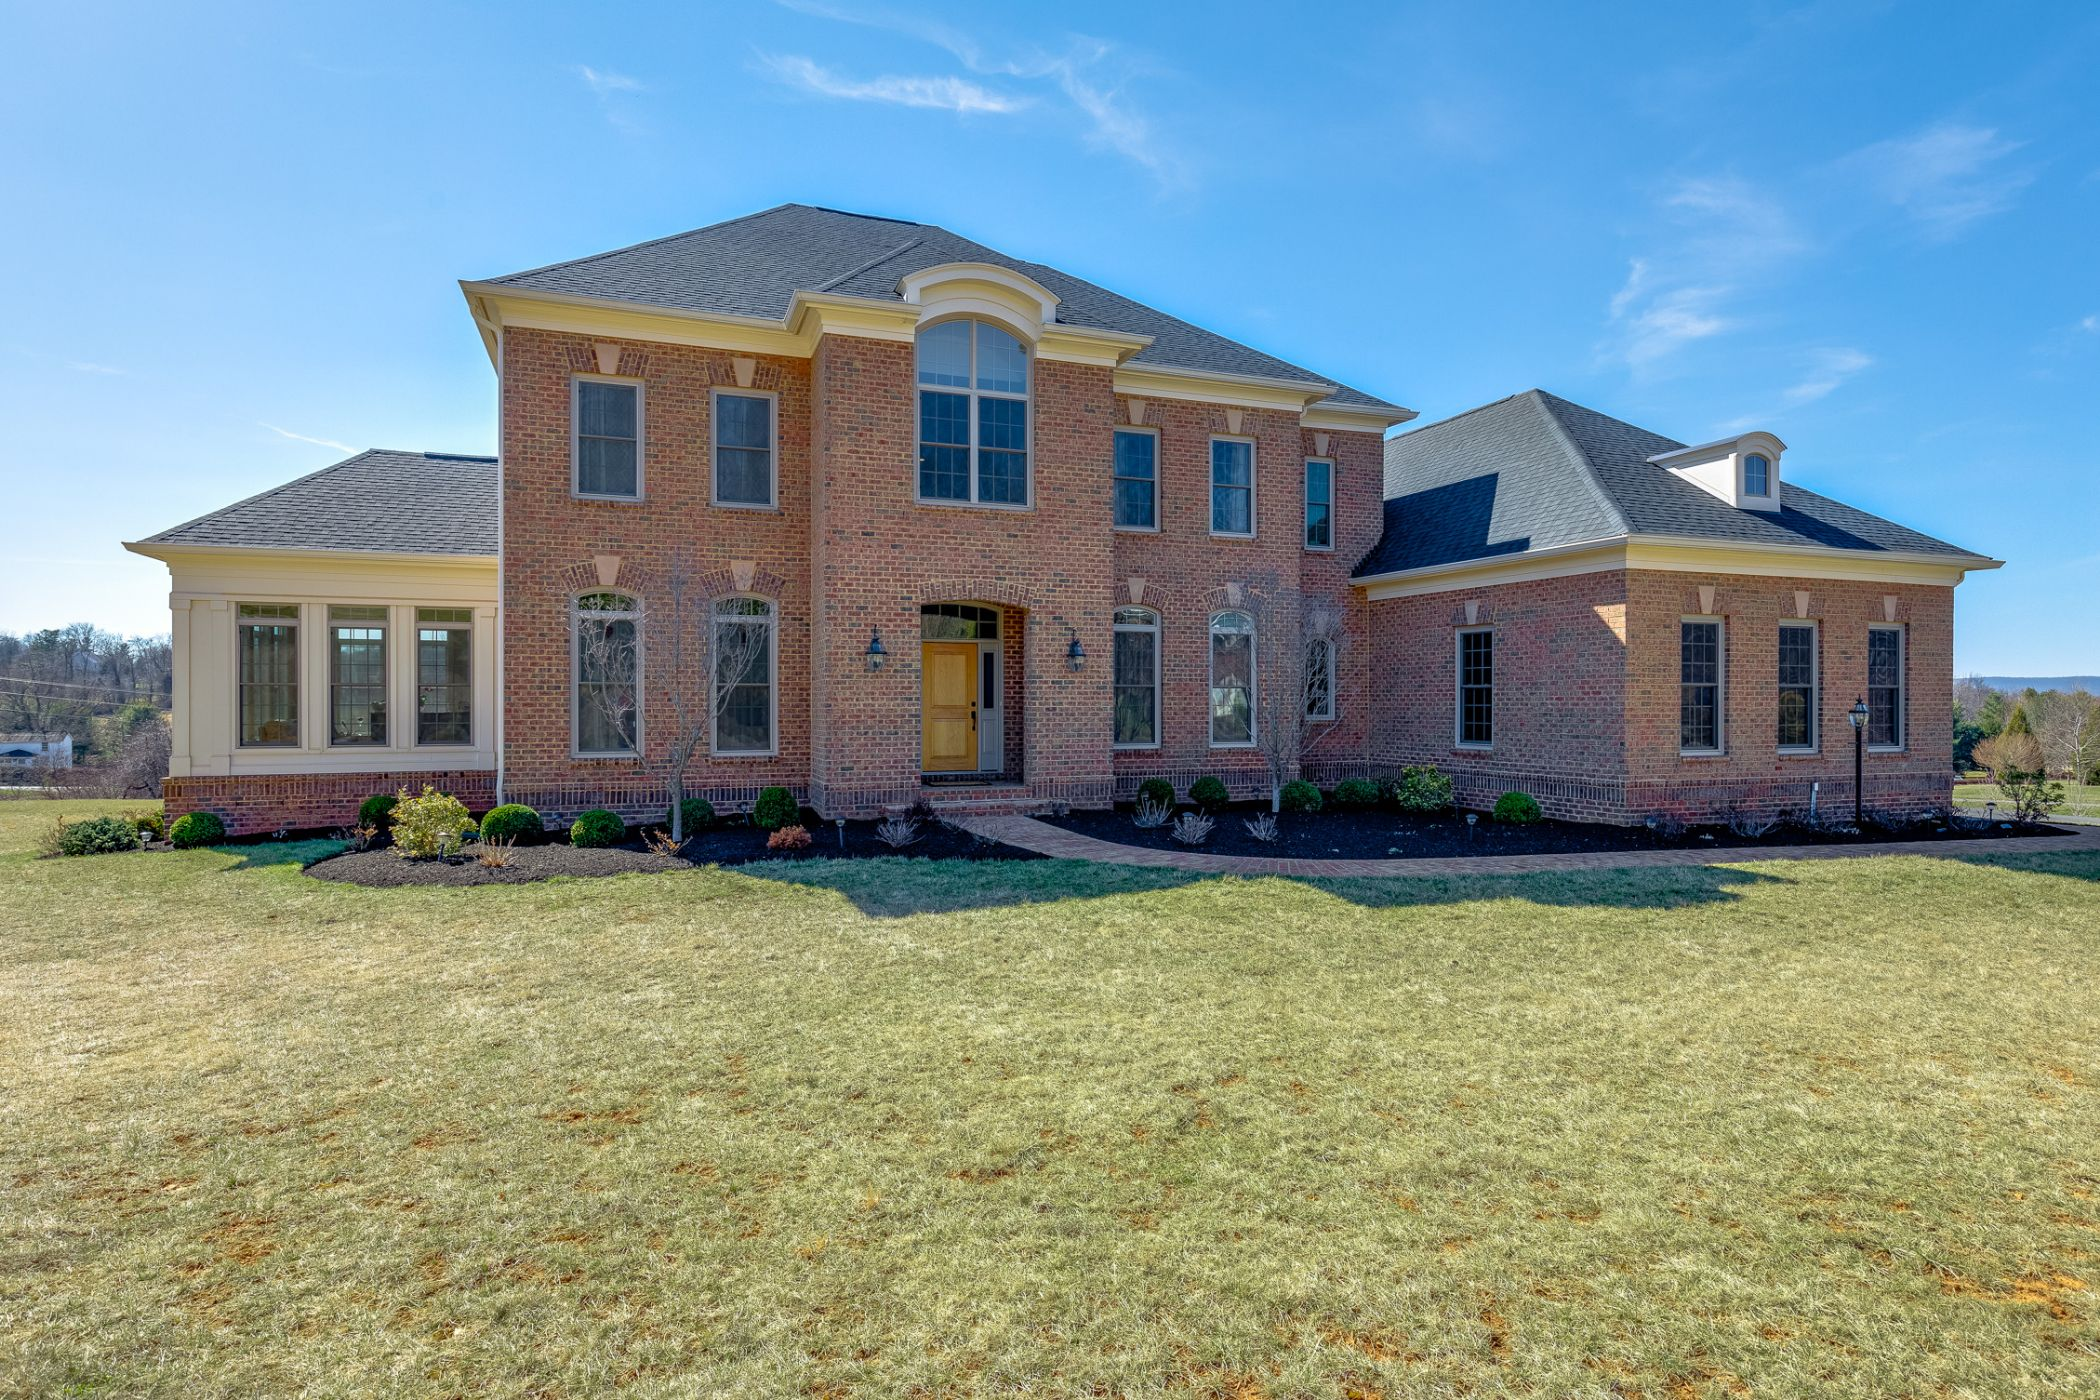 Leesburg Home, VA Real Estate Listing